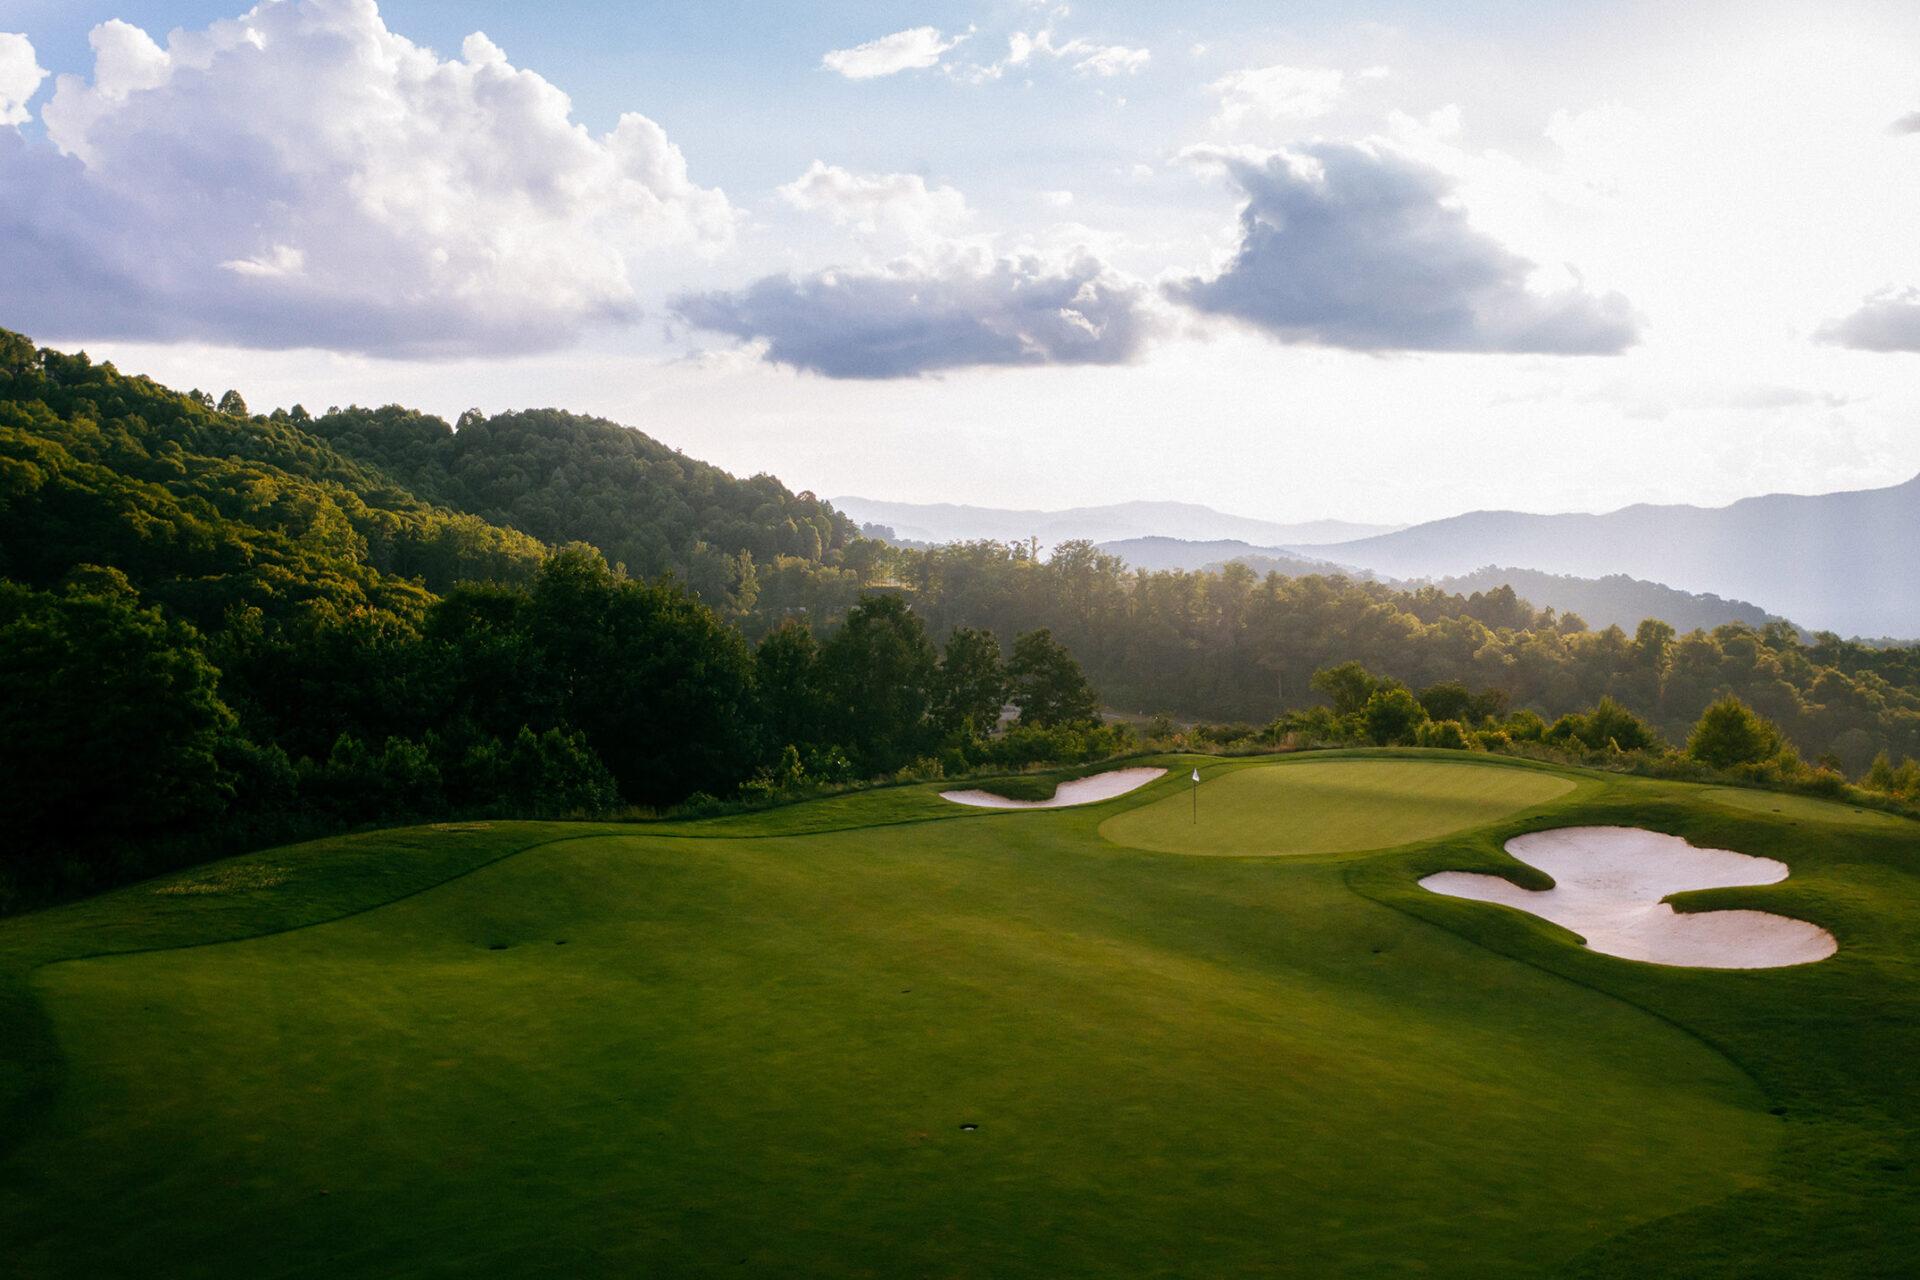 Balsam Golf Hole 14